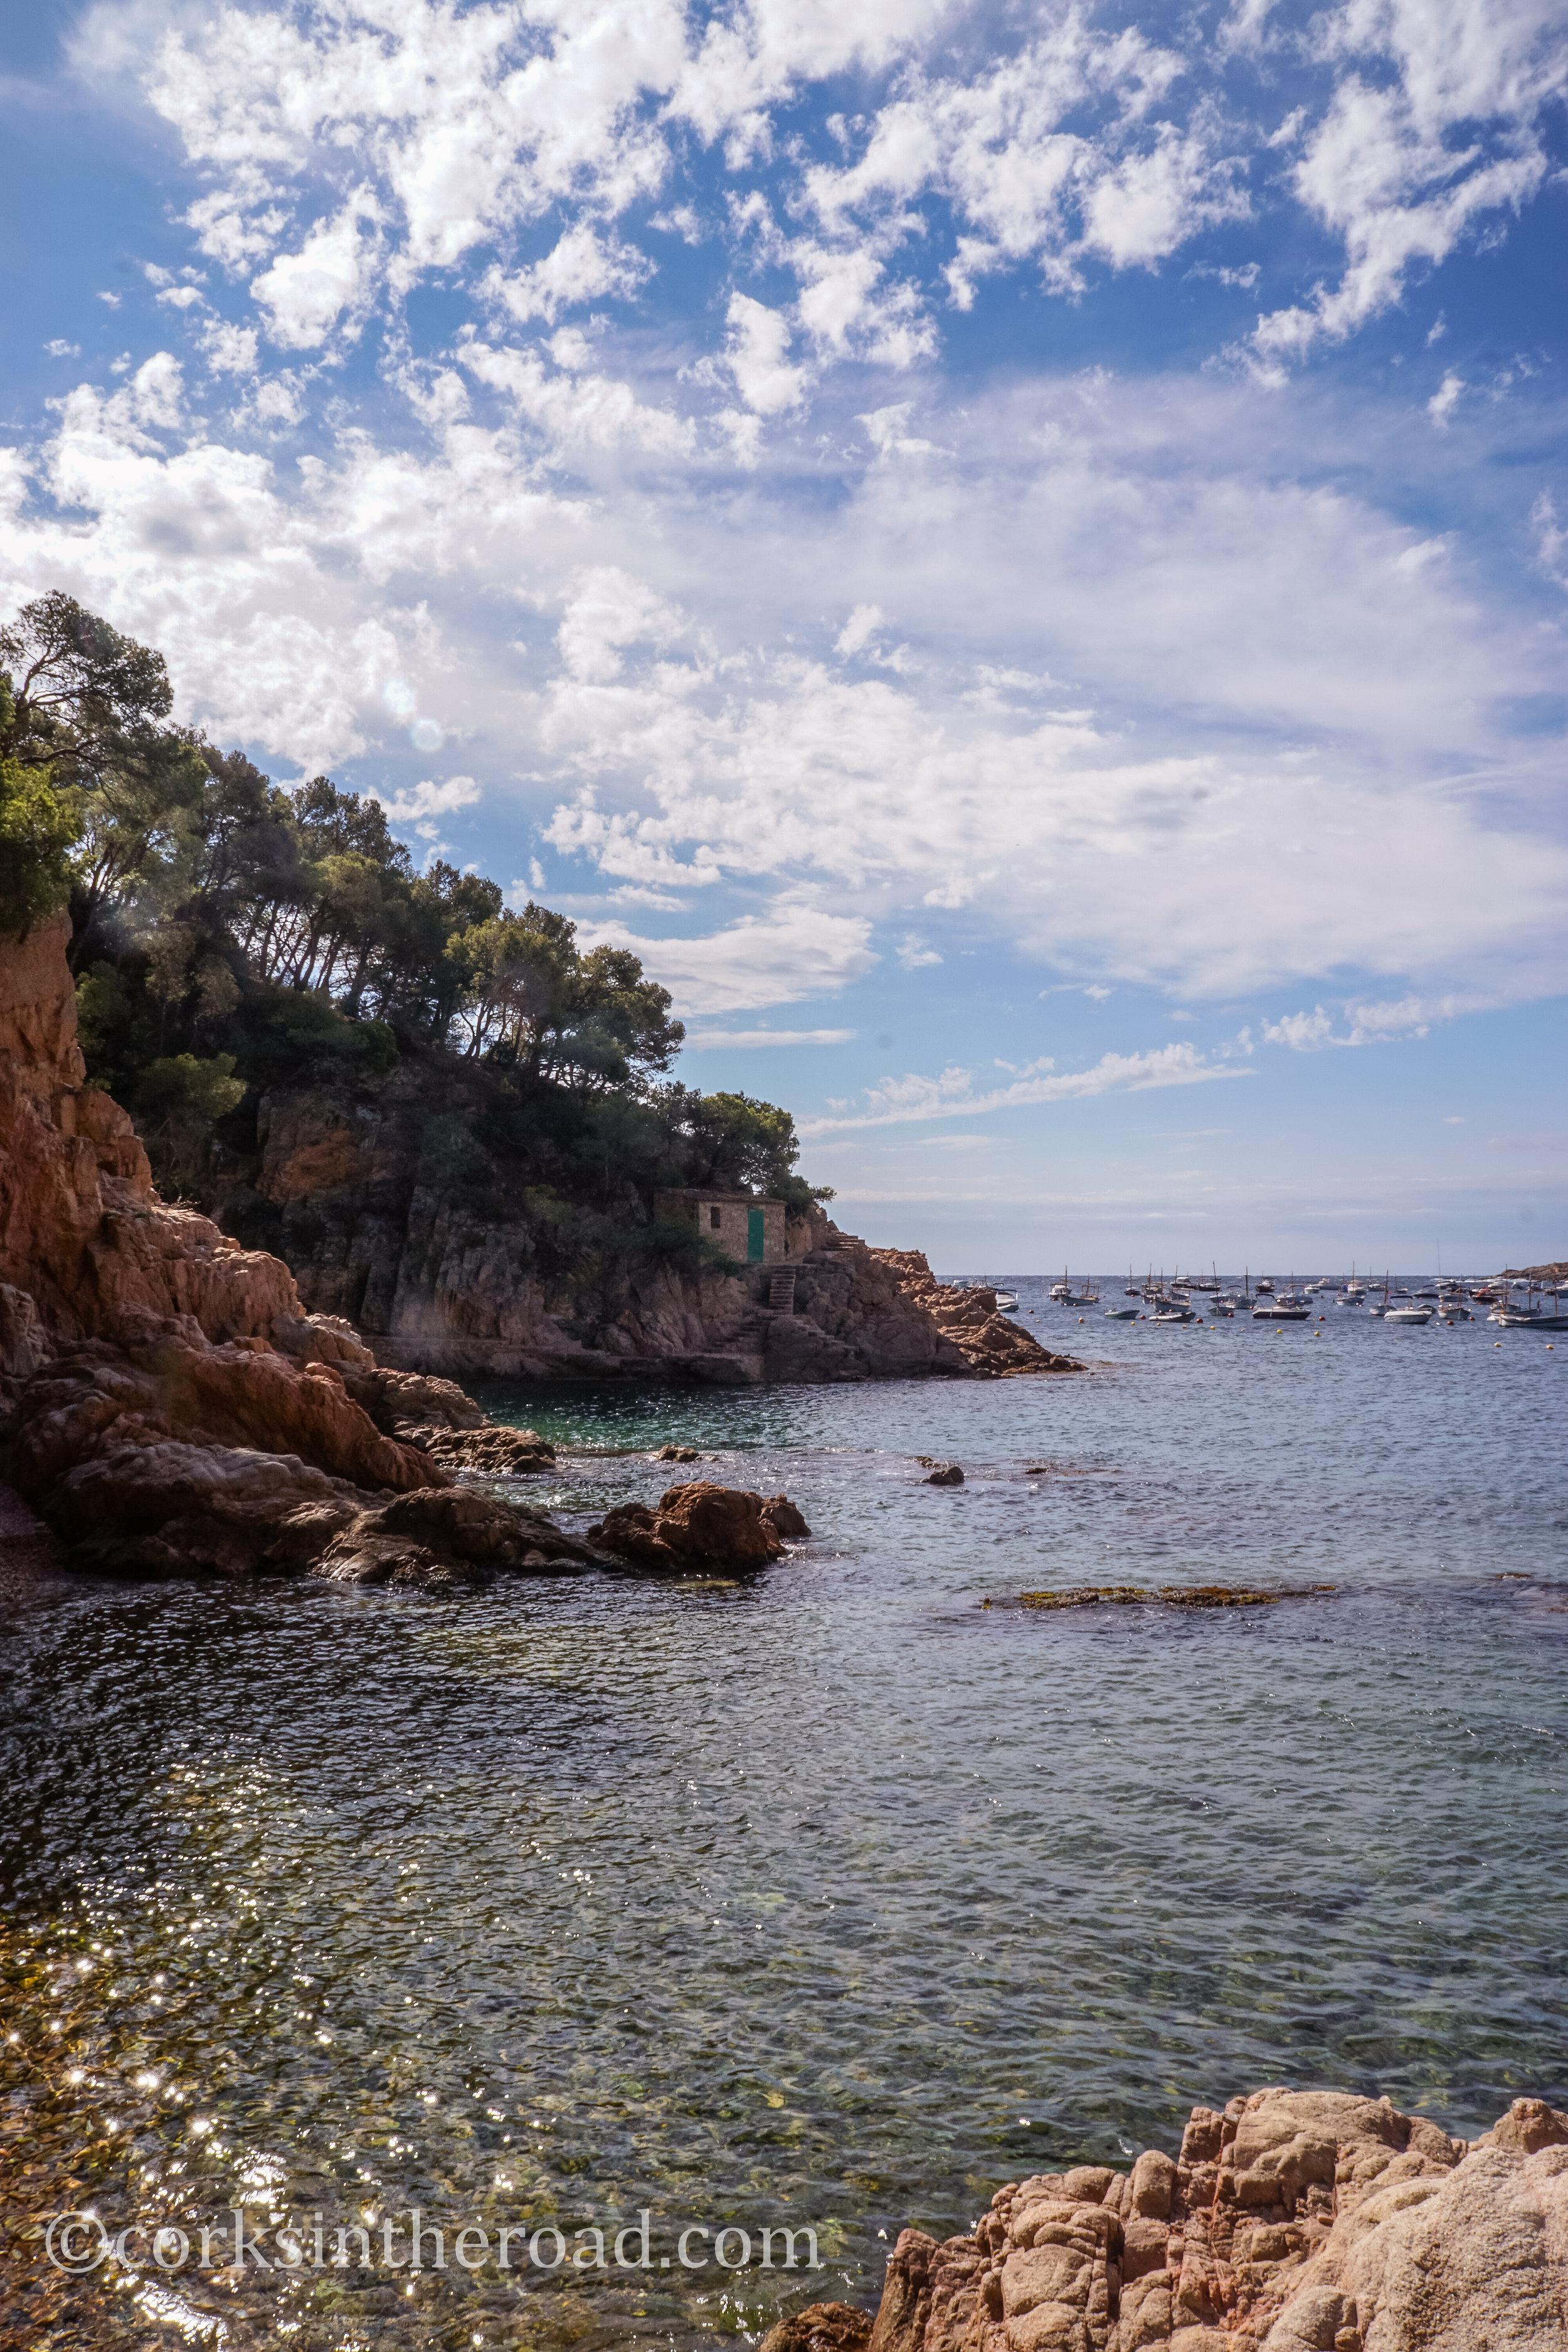 20160810Barcelona, Corksintheroad, Costa Brava, Costa Brava Landscape-7.jpg